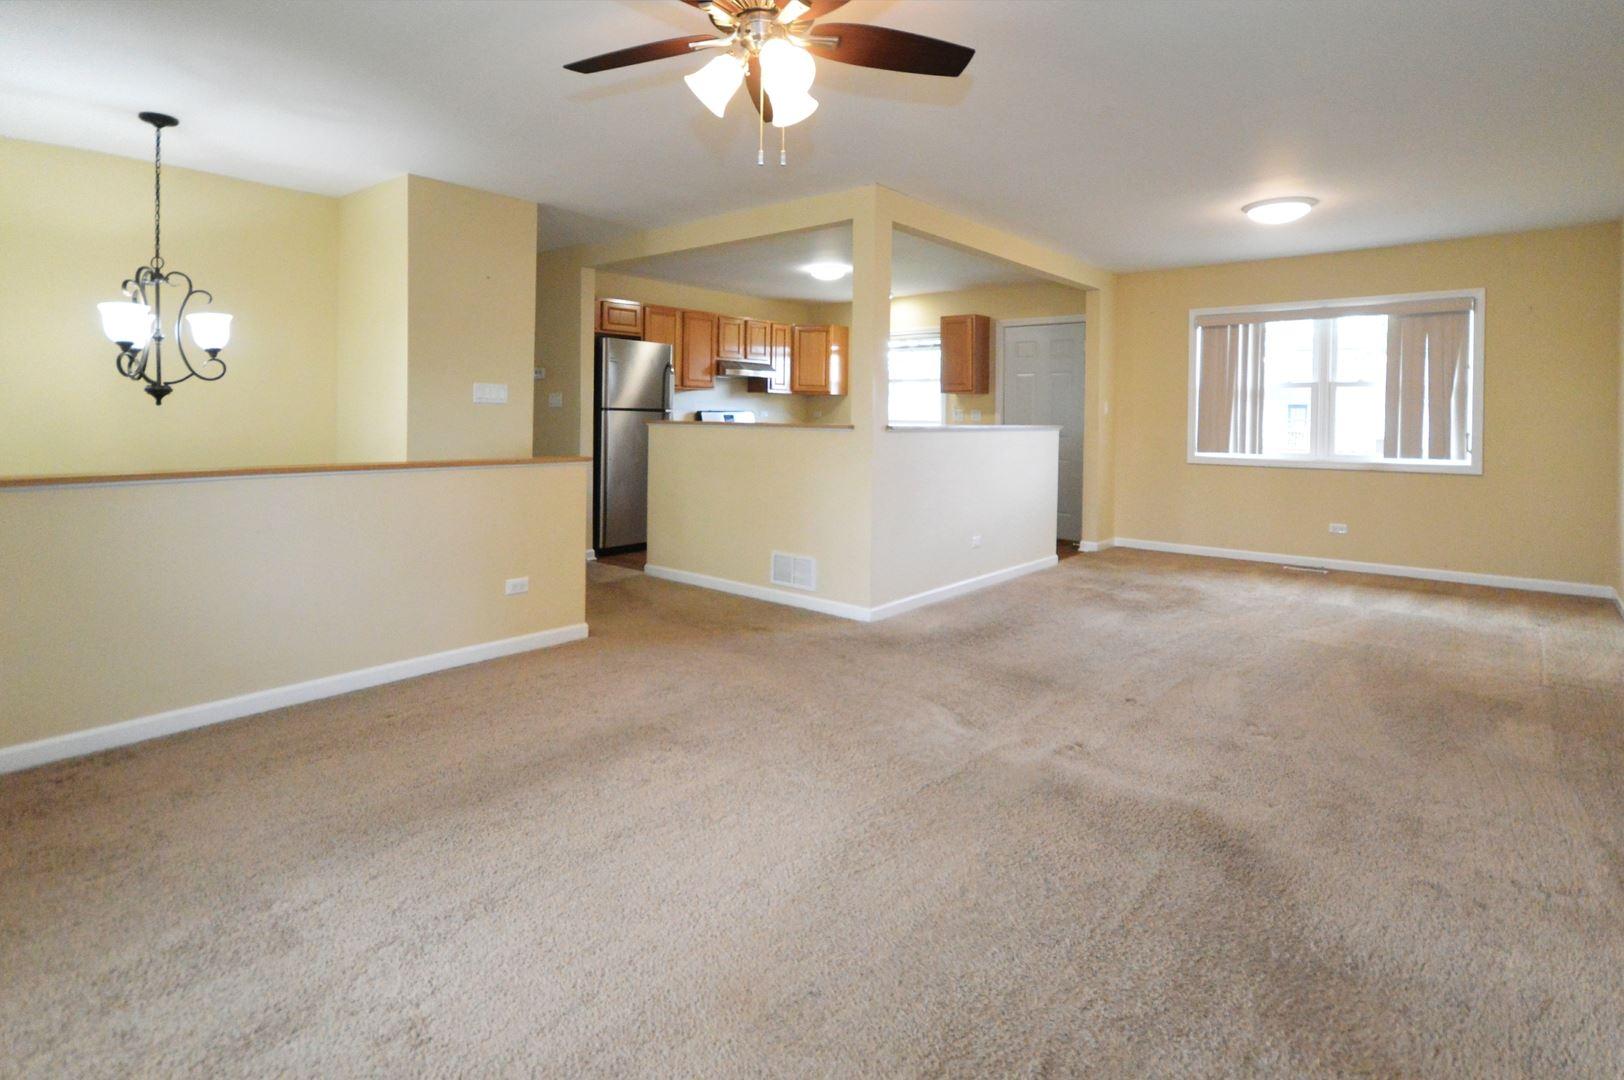 Photo of 340 Eaton Avenue, Romeoville, IL 60446 (MLS # 10887785)